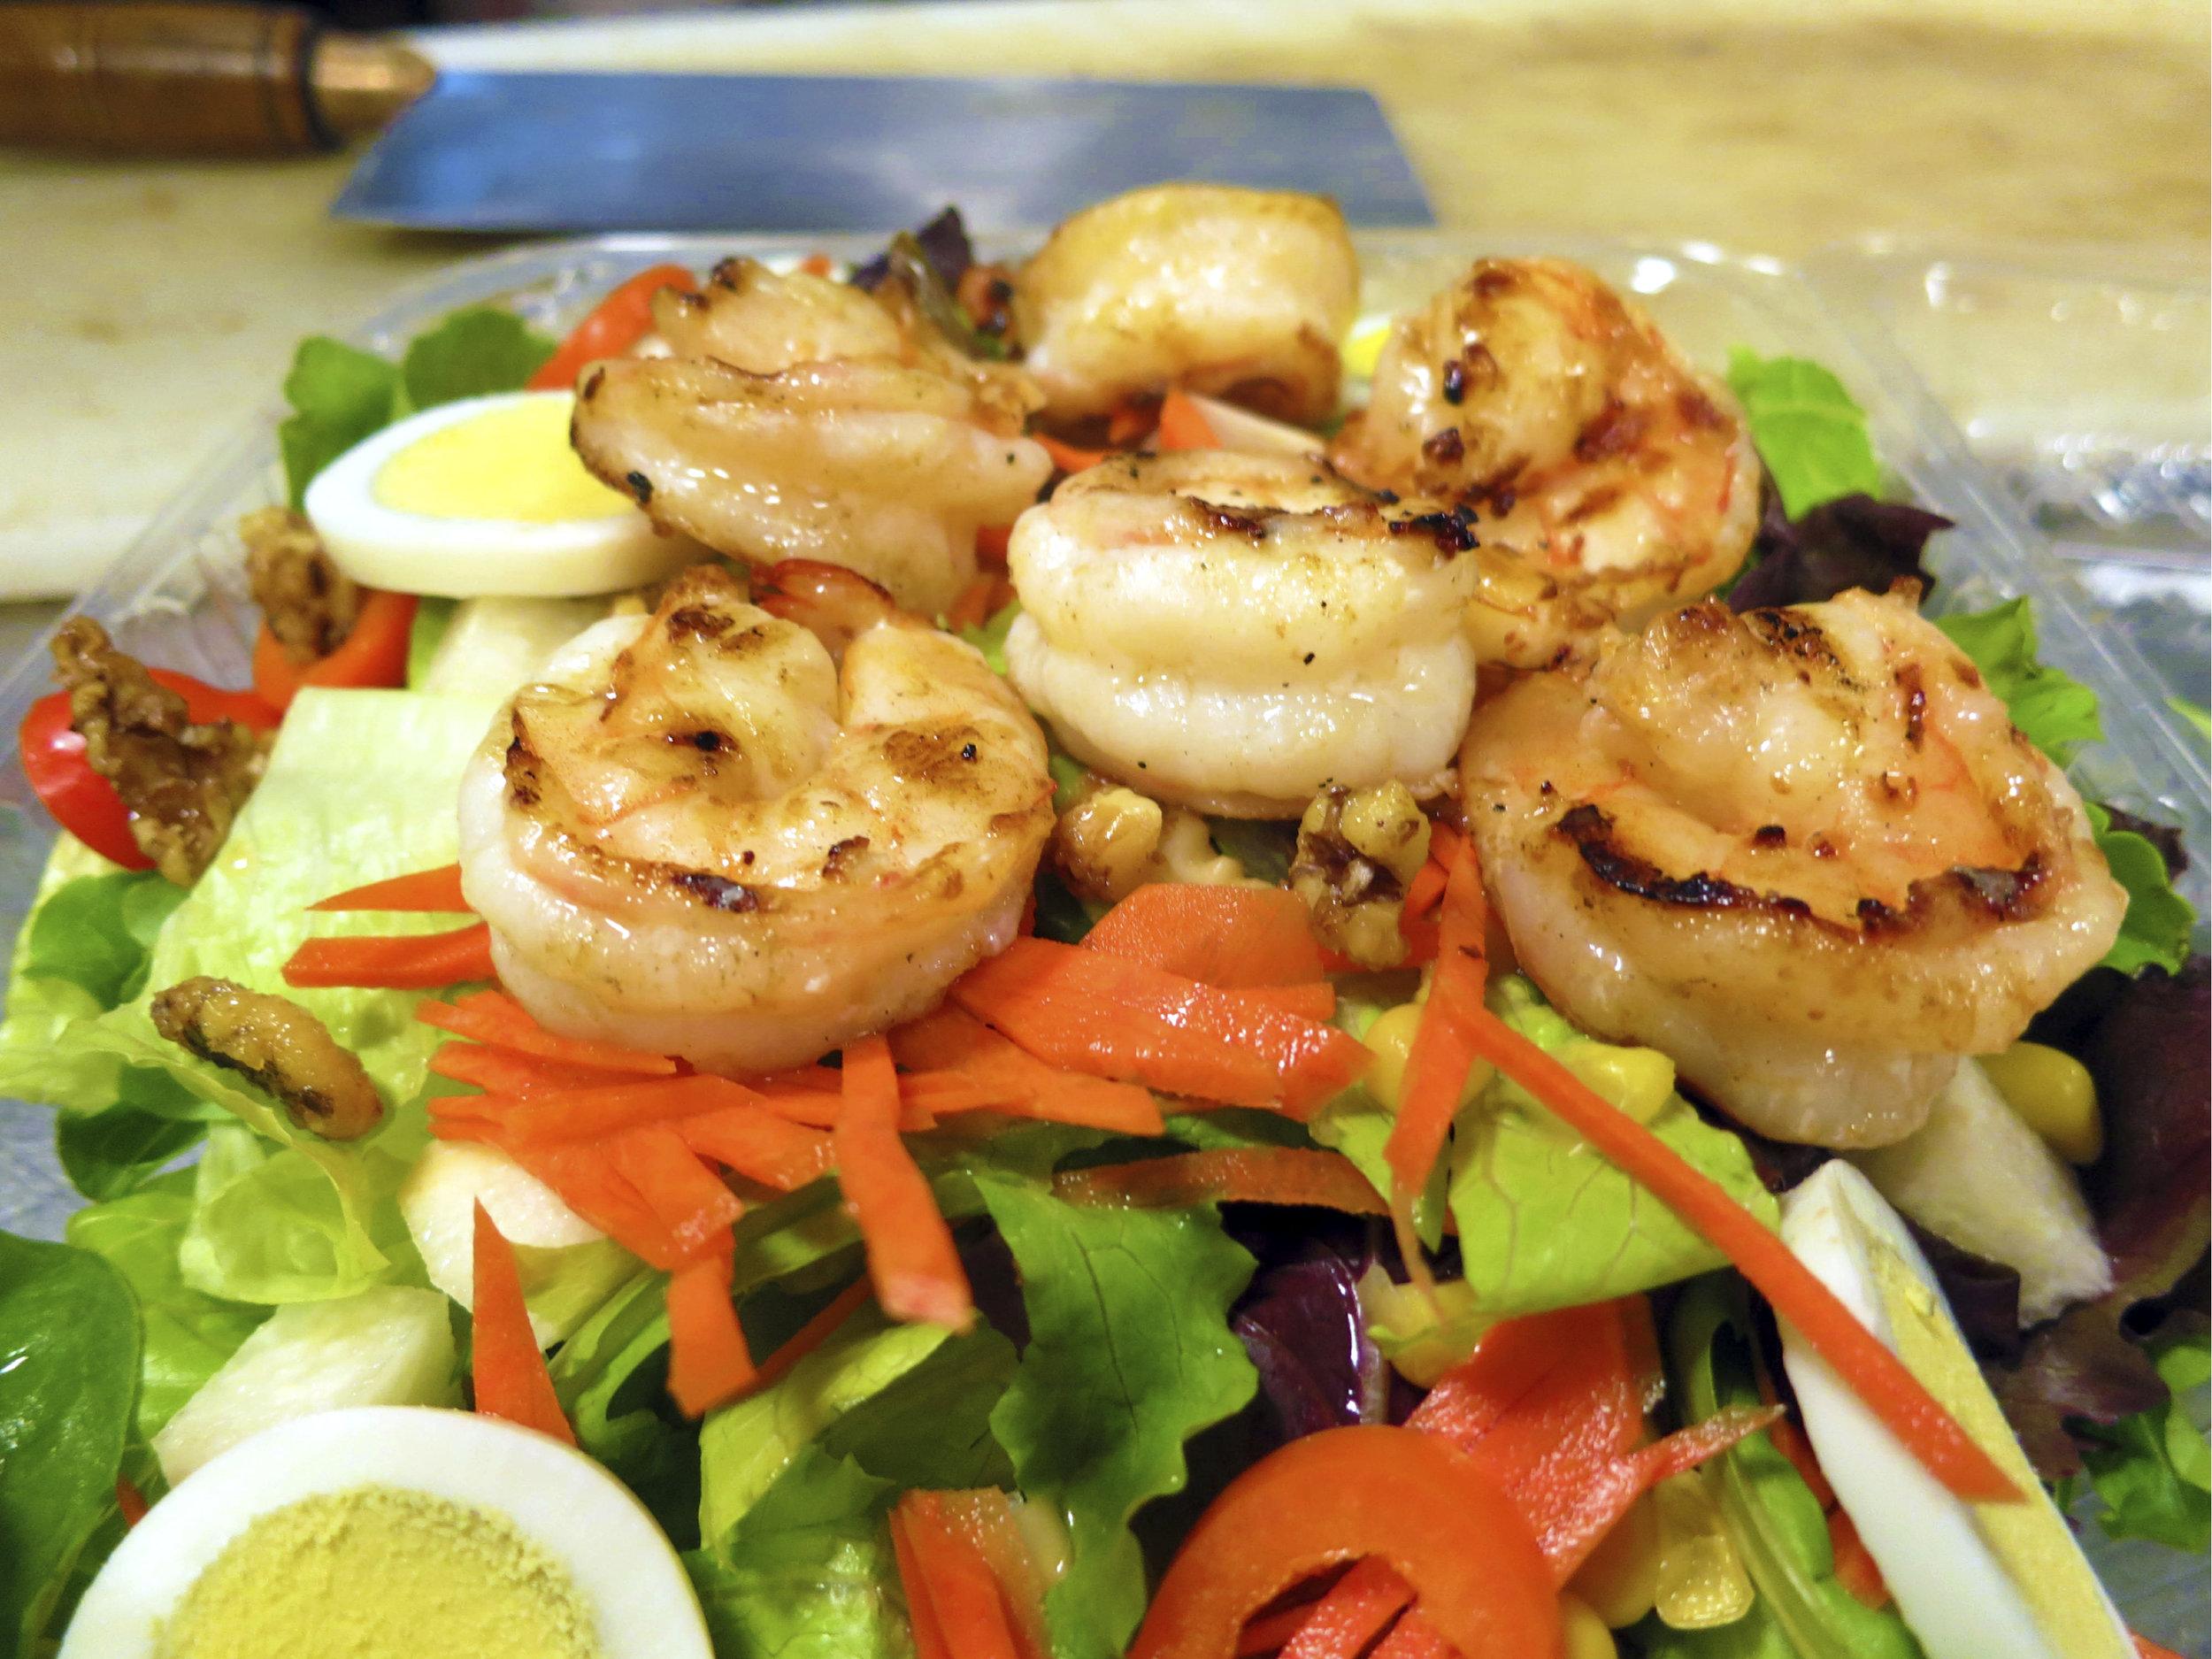 Green Mix Eats Salad Sandwich Restaurant Greenmix Menu Phoenix